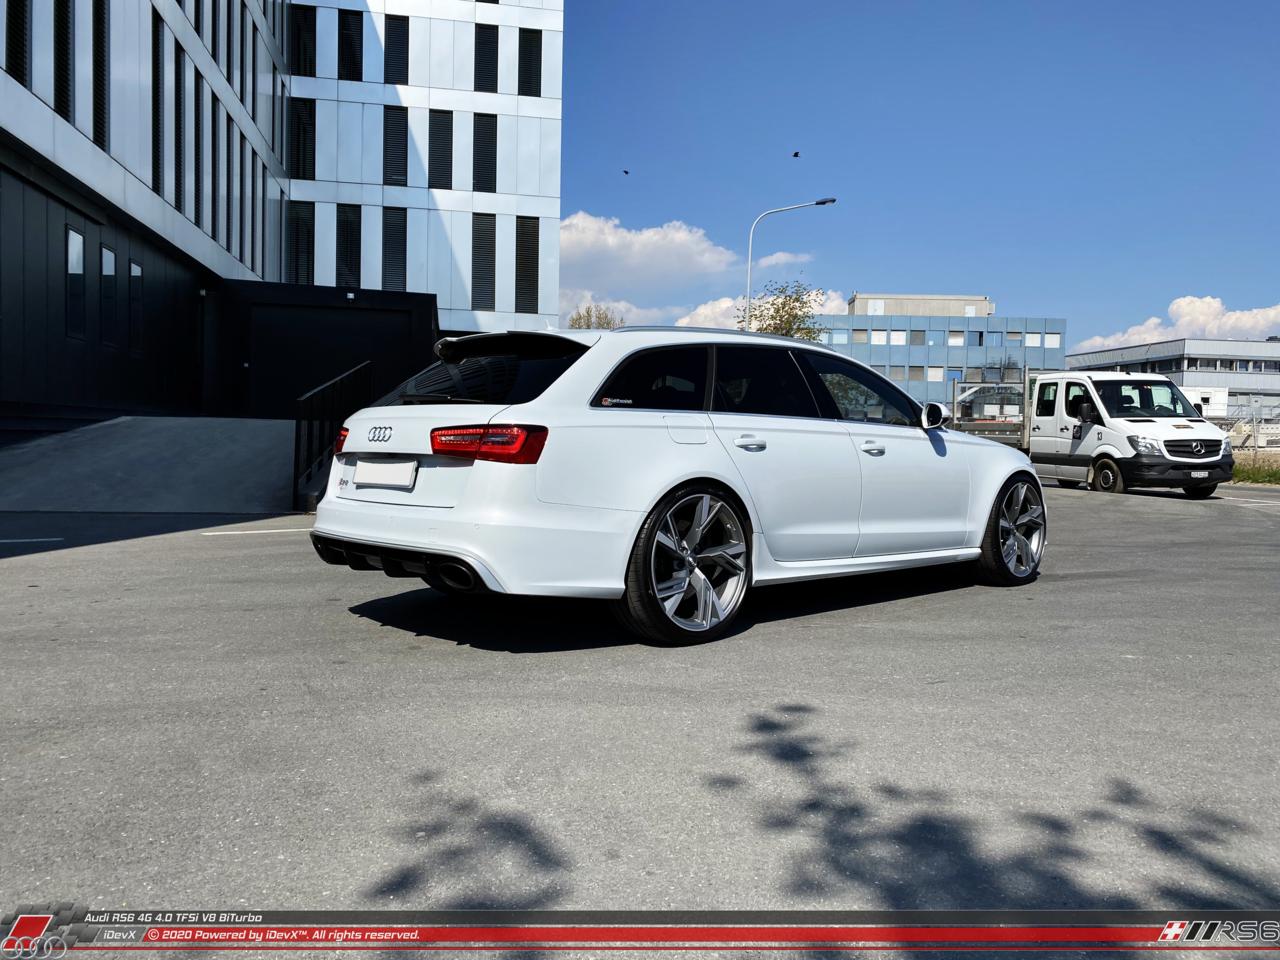 24.04.2020_Audi-RS6_iDevX_010.png